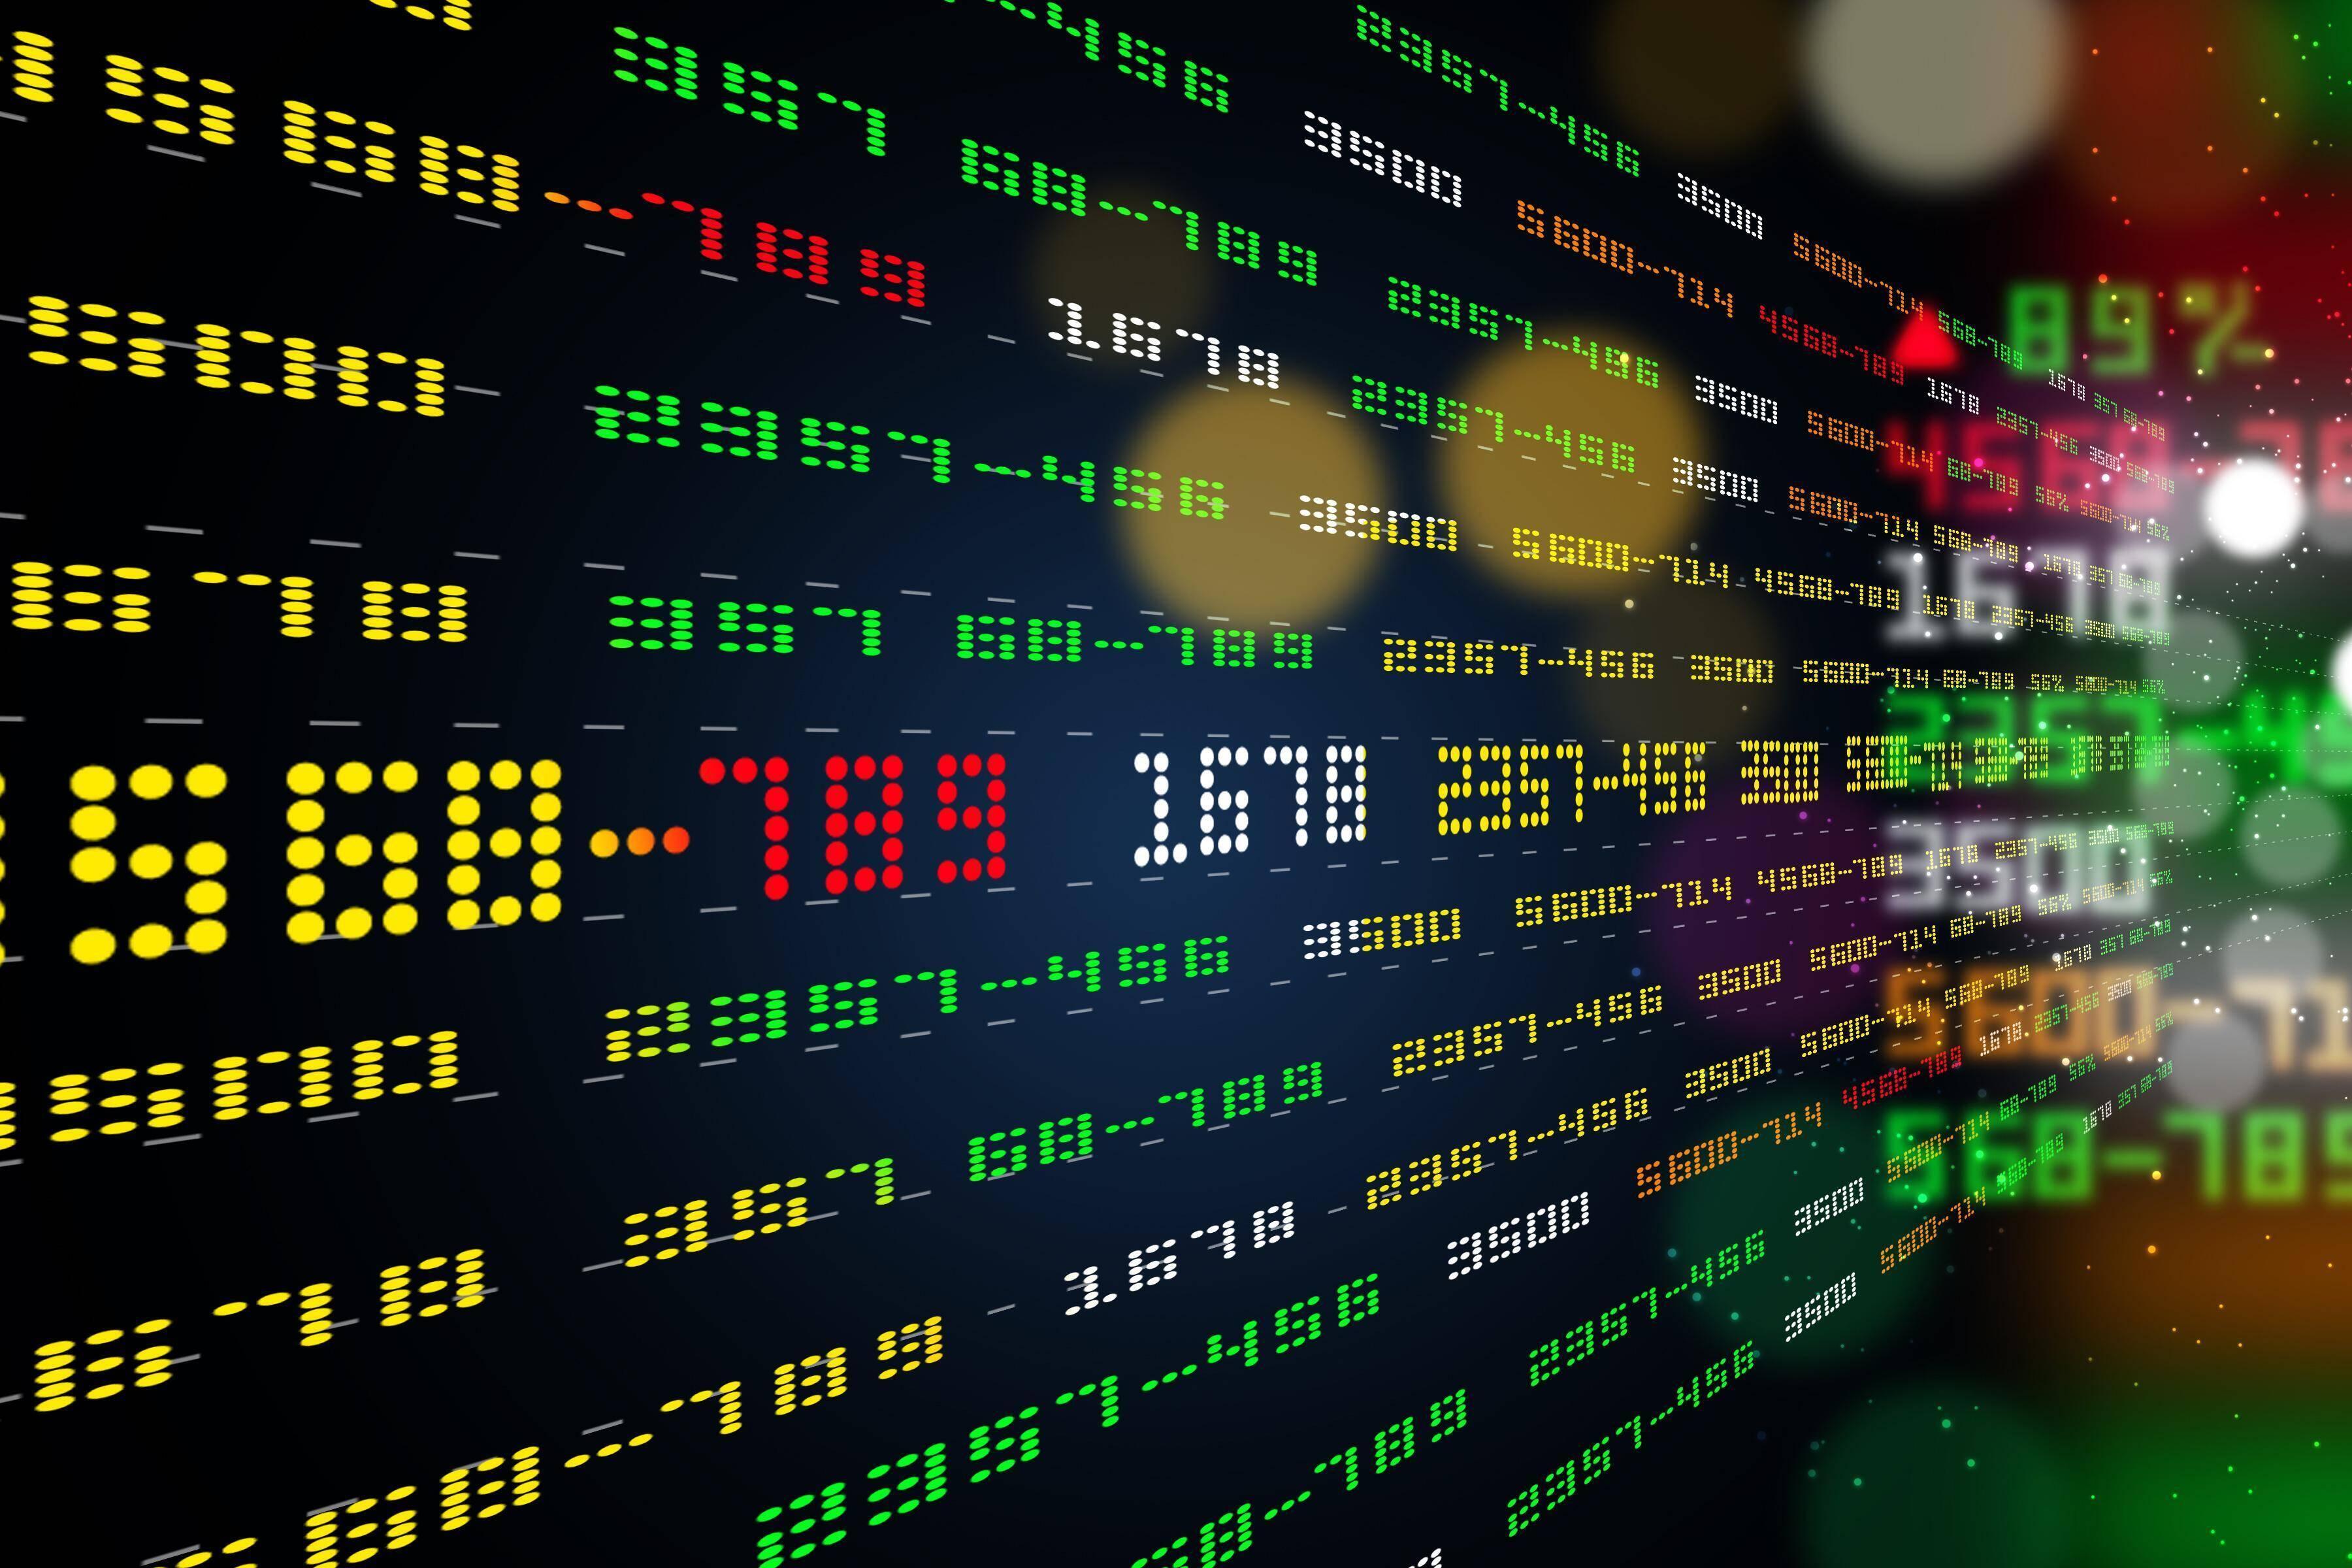 Aktienhandel findet an der Börse statt